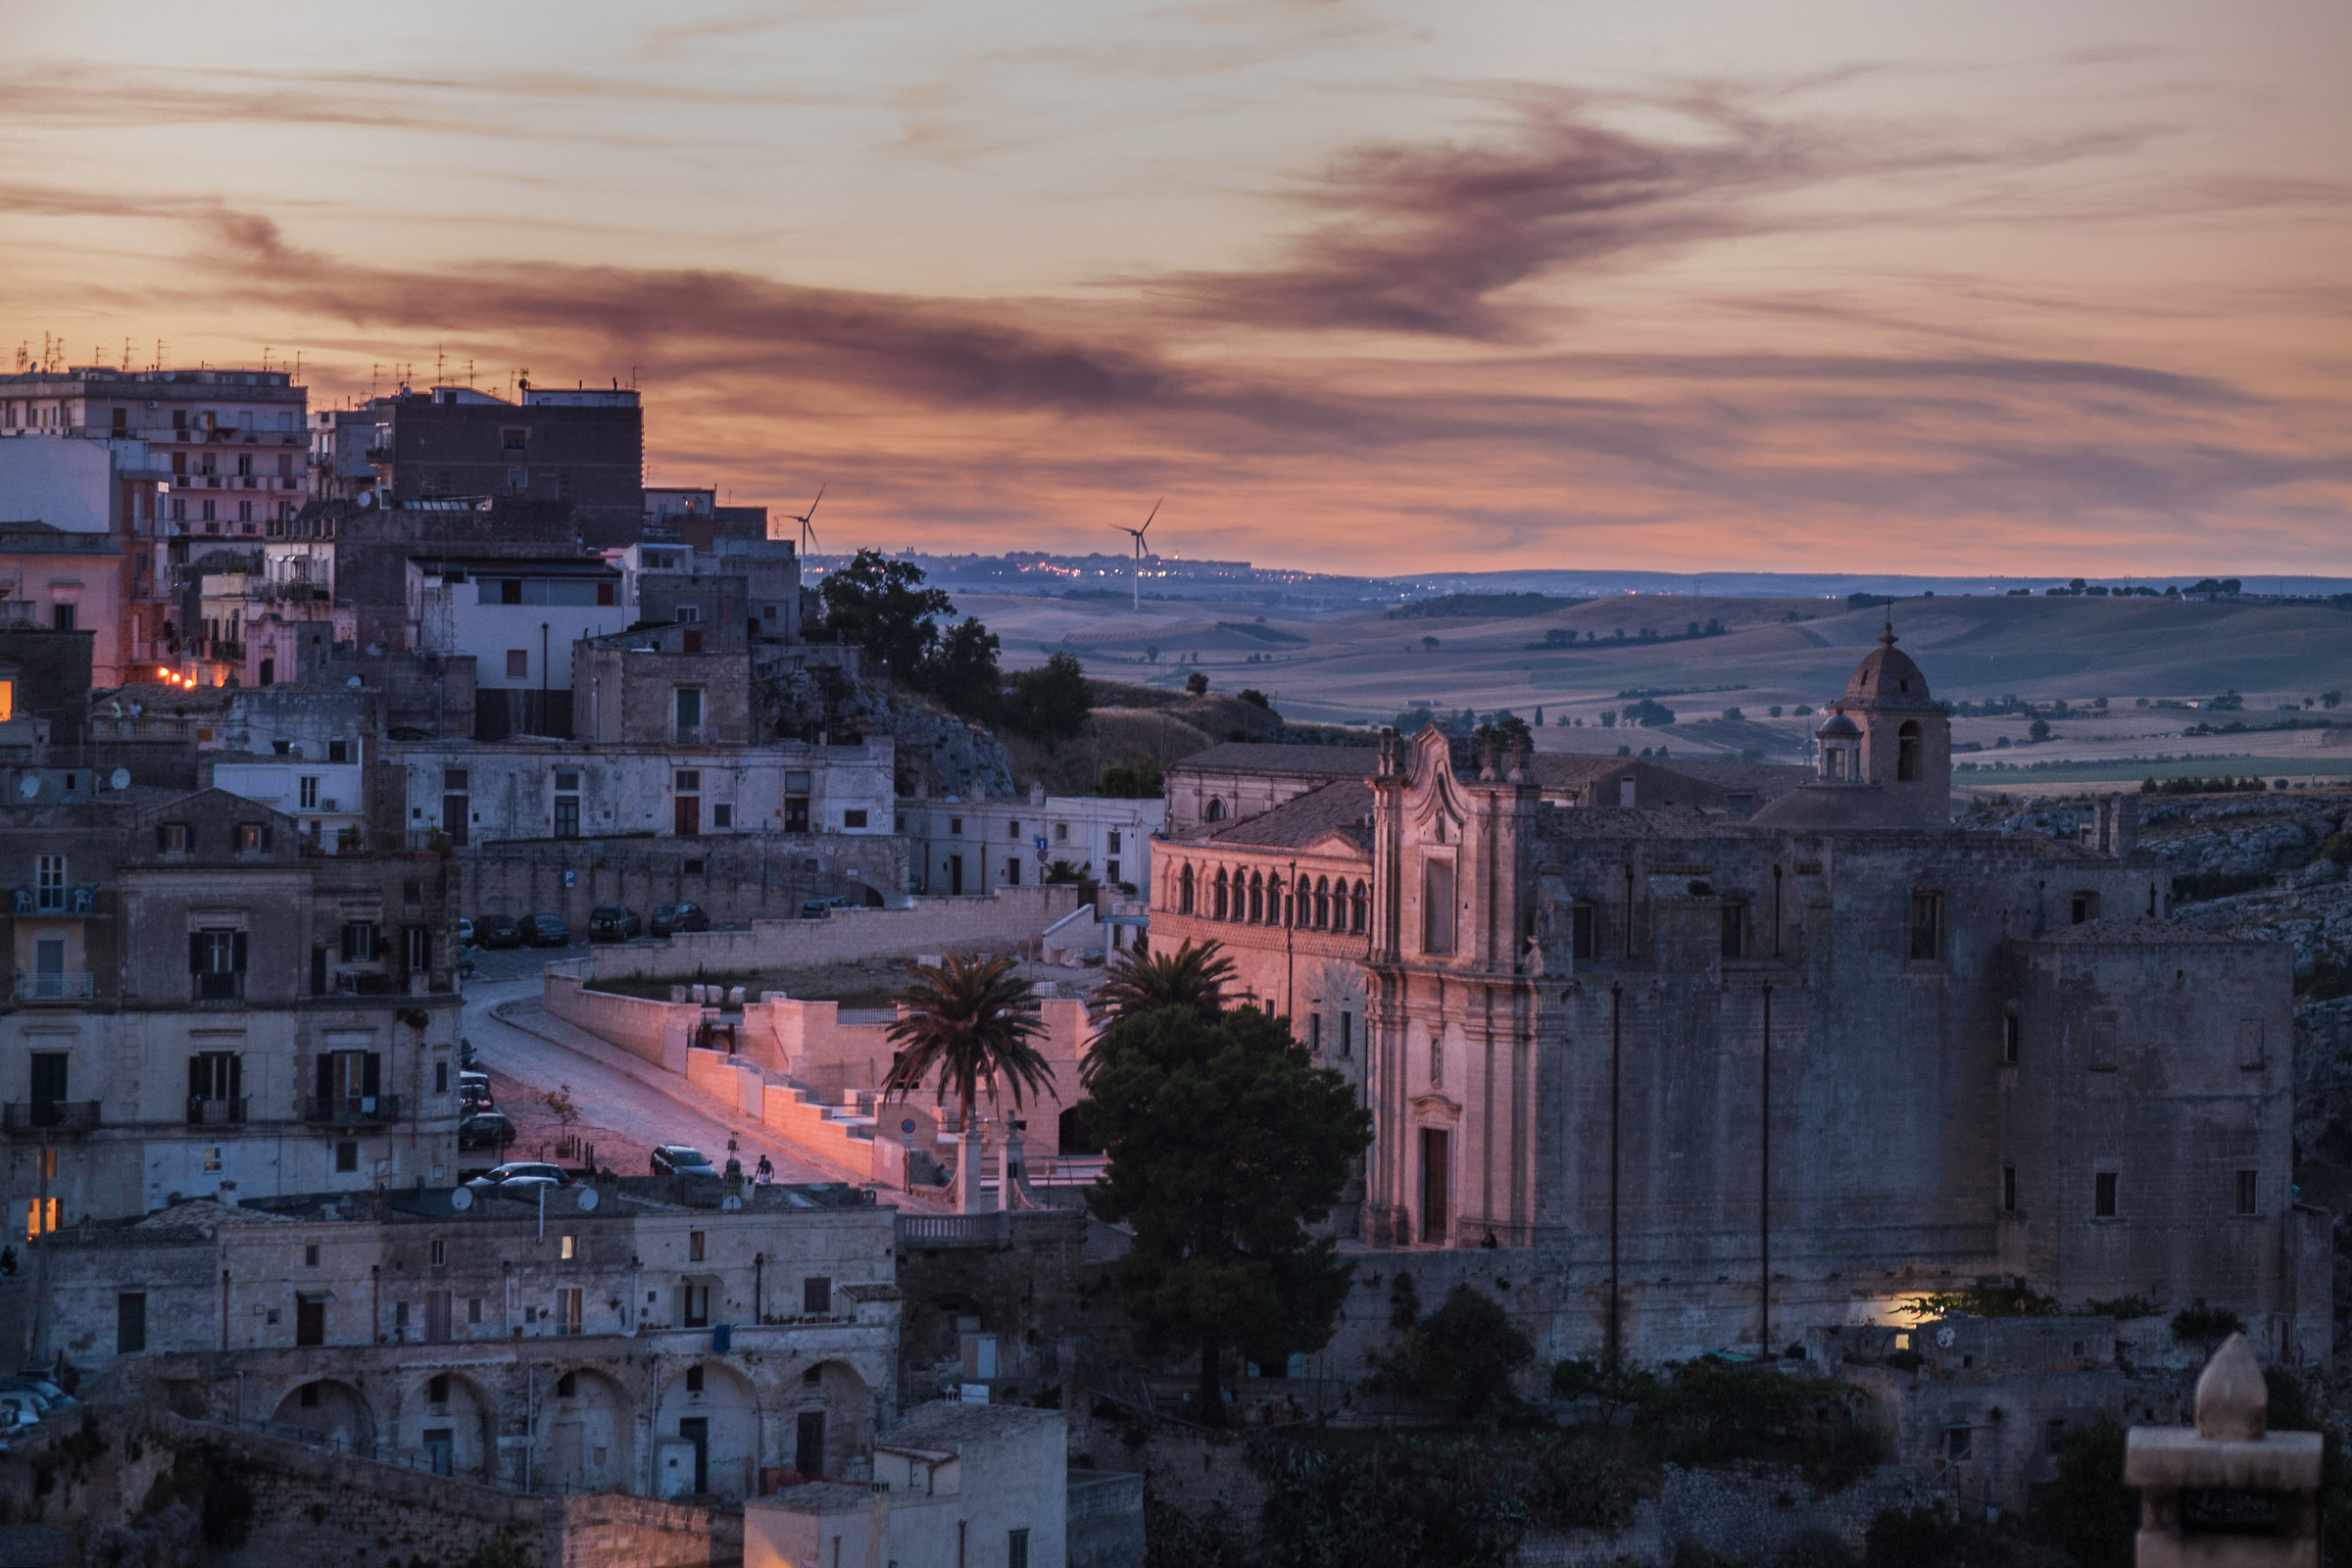 Sunset in Matera...